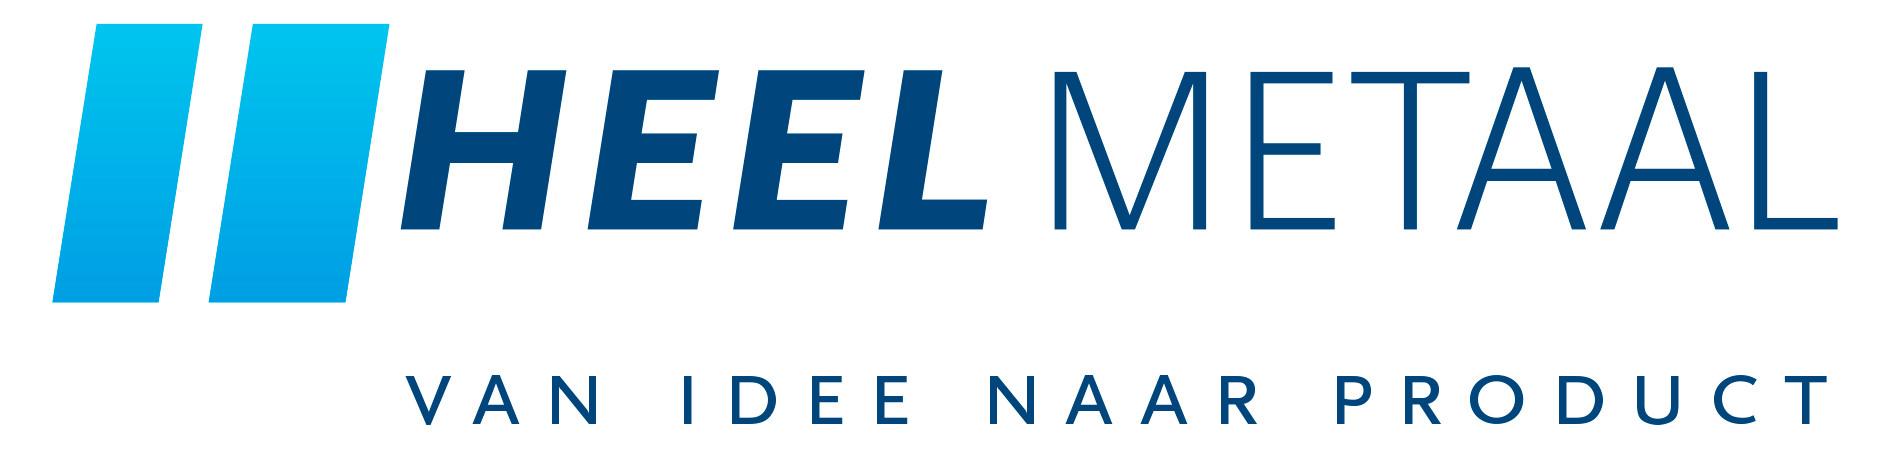 heelmetaal_logo_jun16_01.jpg